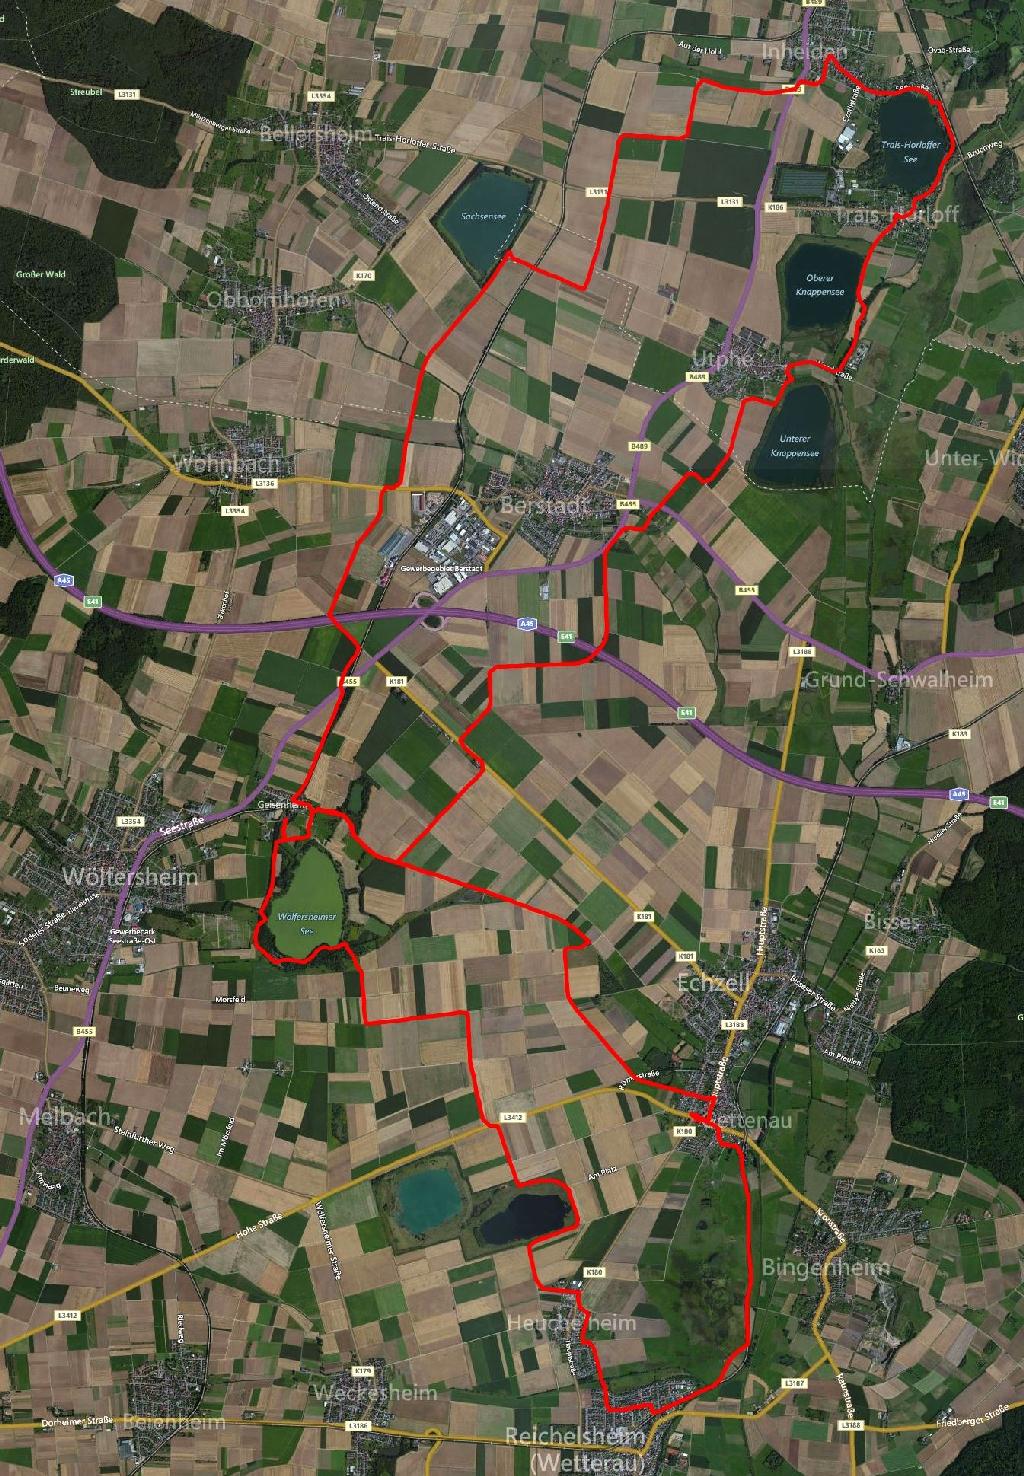 Wetterauer_Map